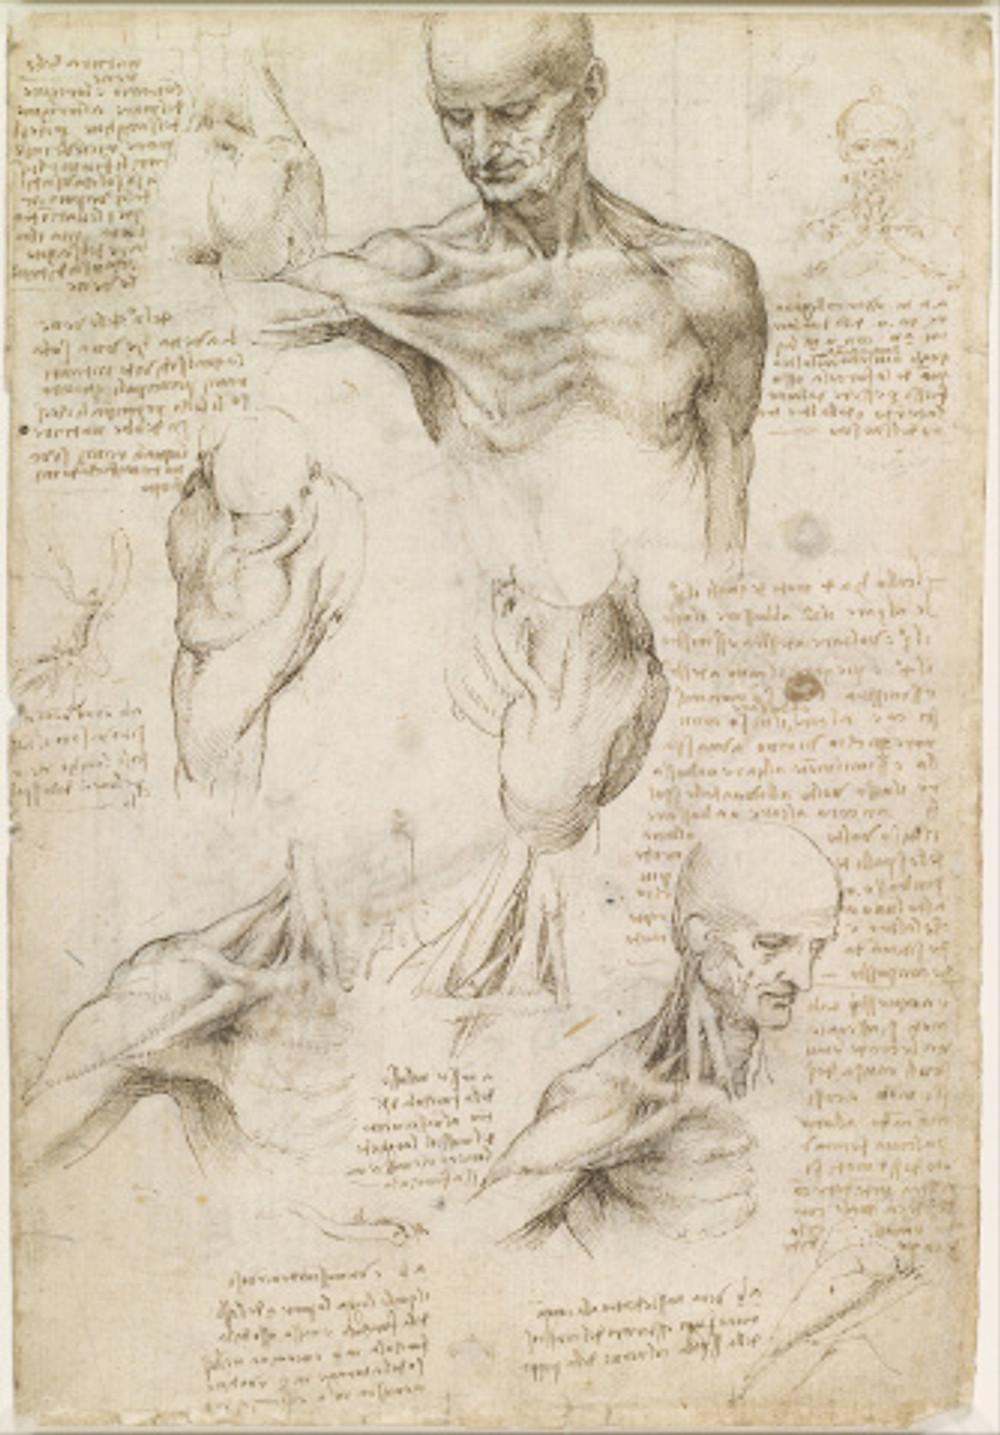 leonardo_da_vinci_-_superficial_anatomy_of_the_shoulder_and_neck_28recto29_-_google_art_project